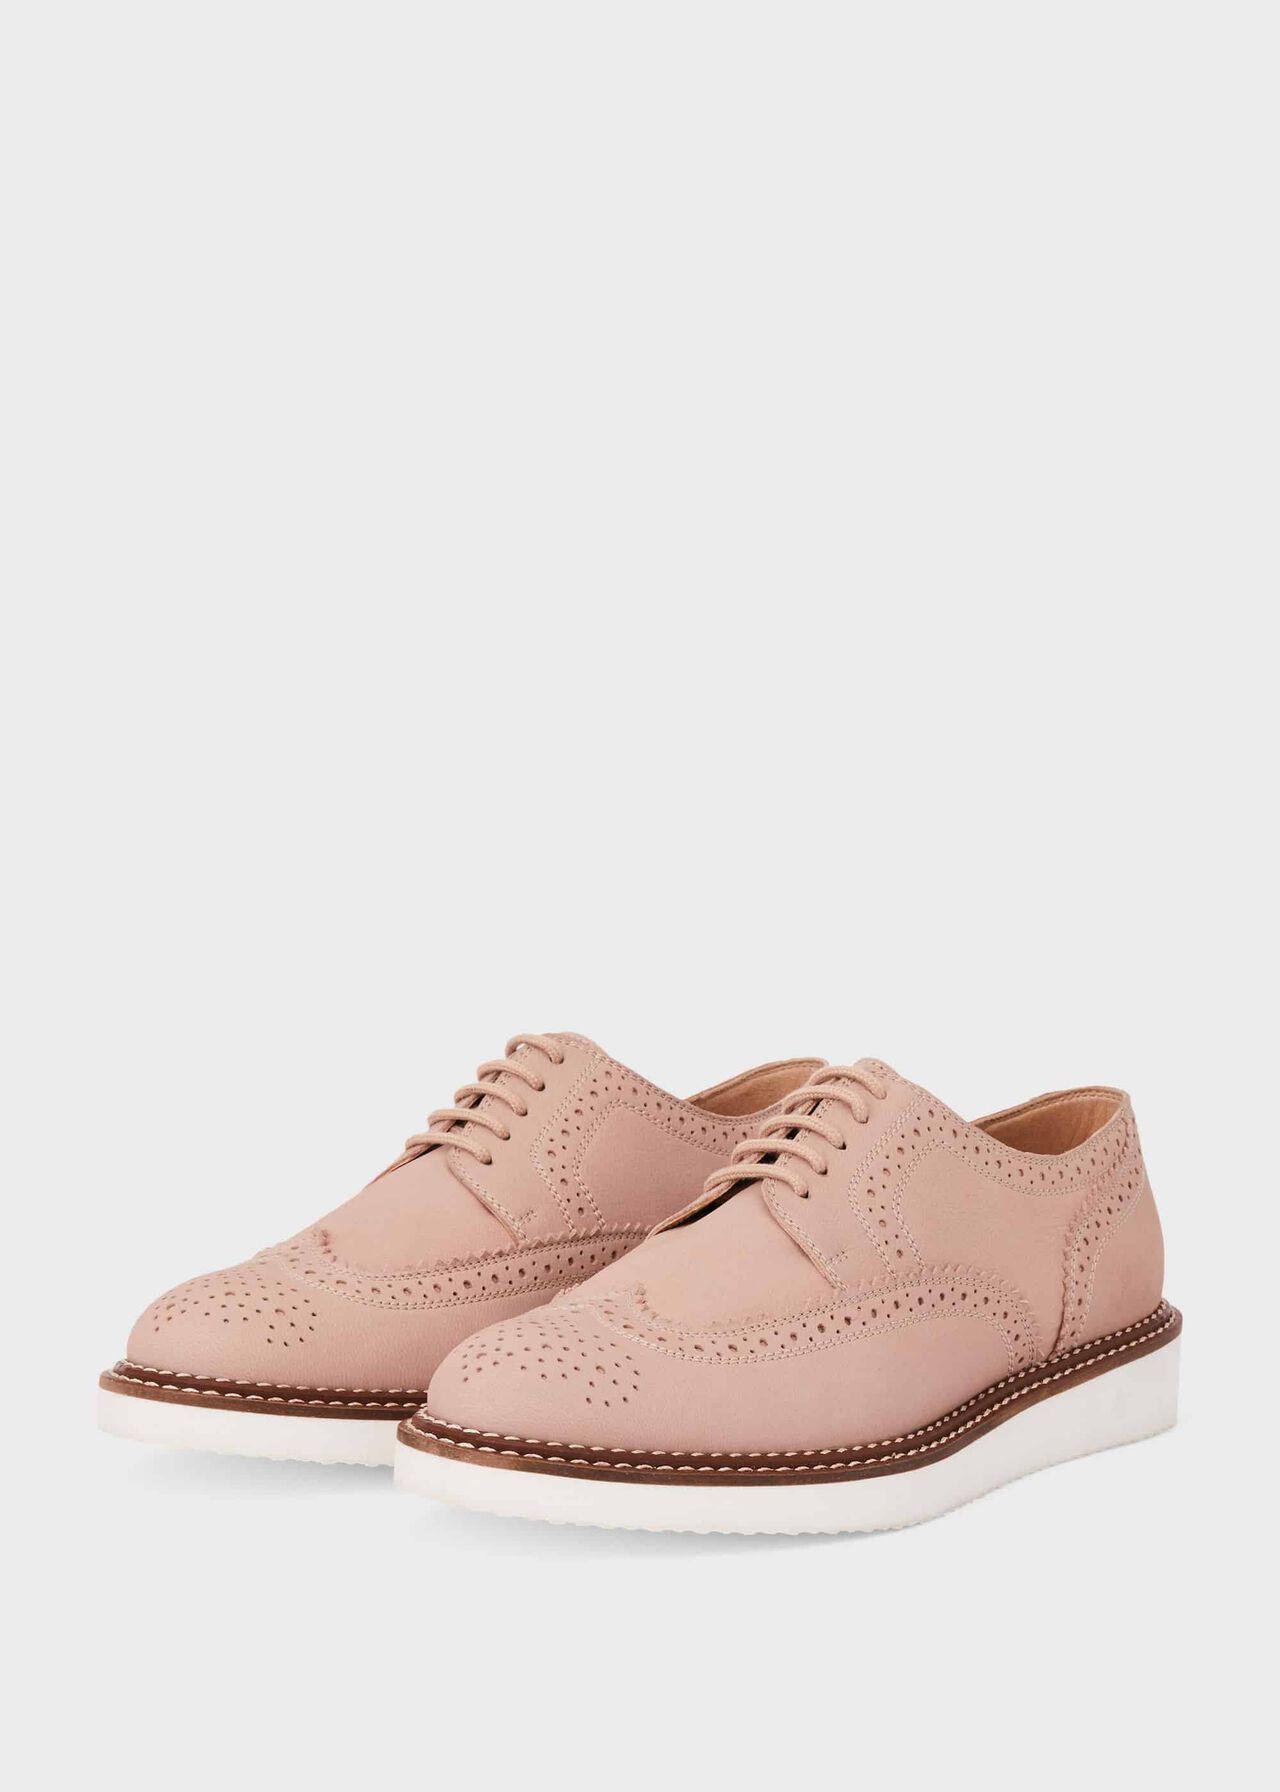 Ottilie Leather Flatform Shoes Fawn